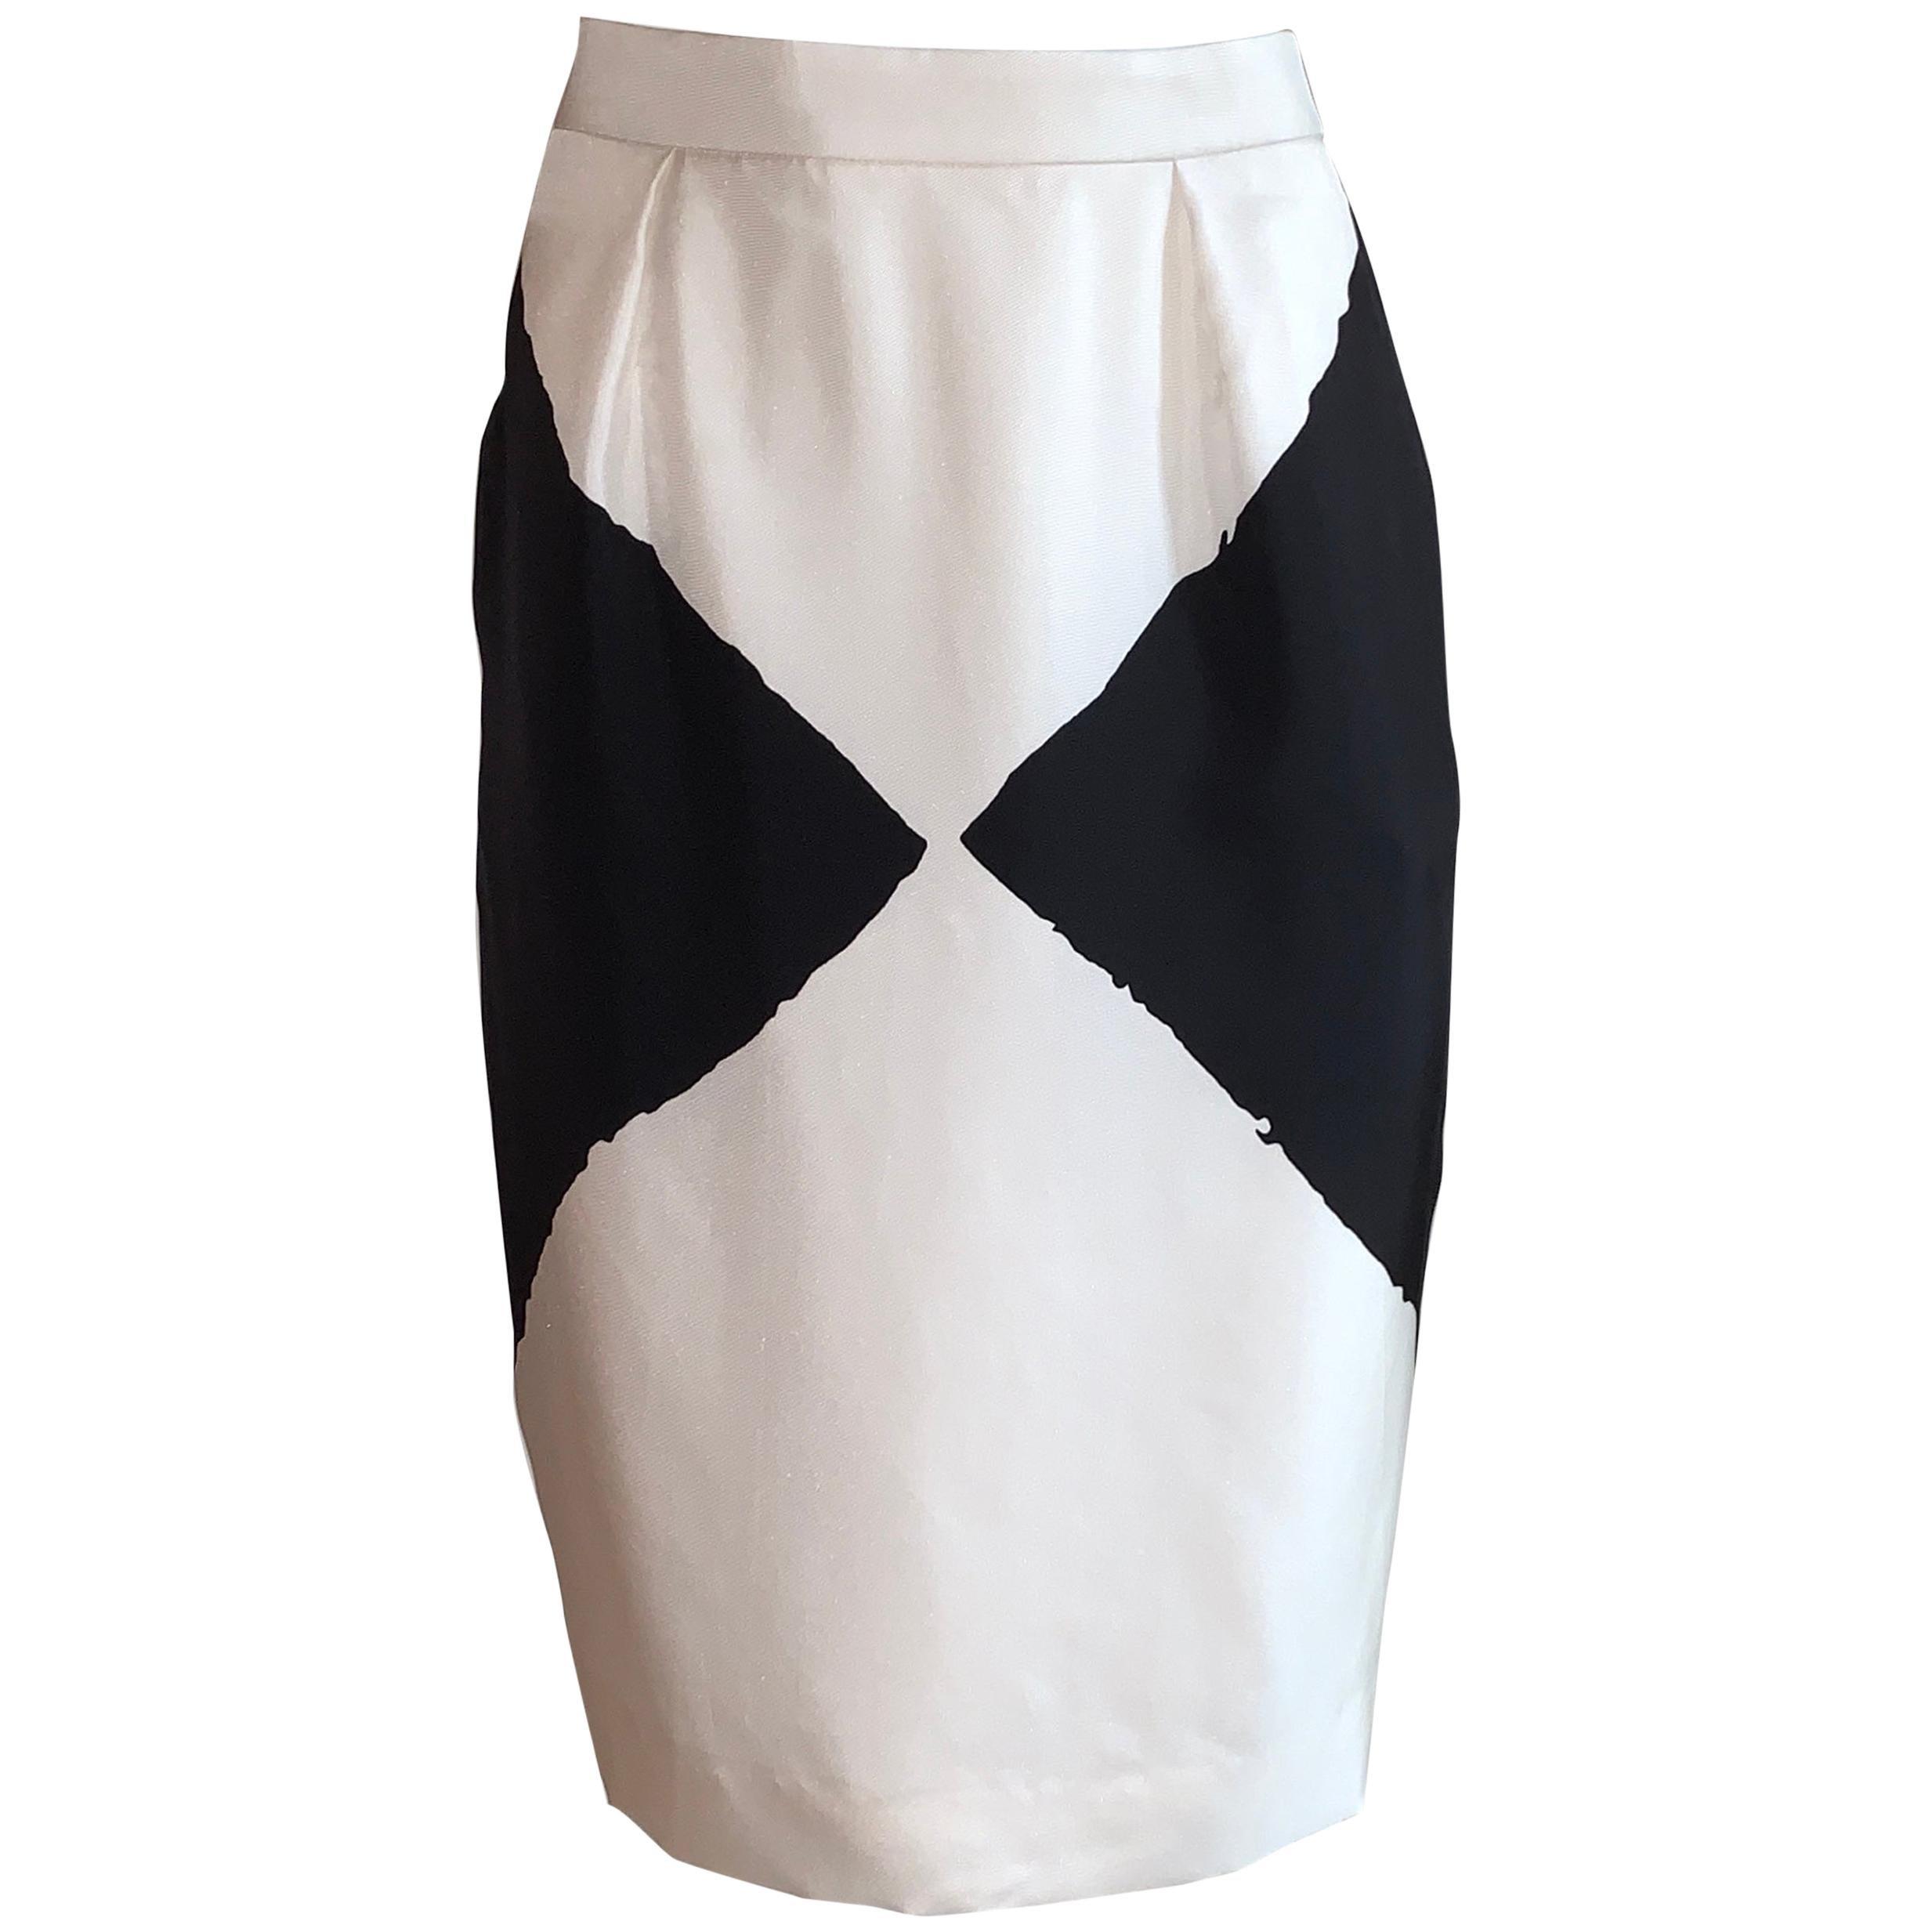 Yves Saint Laurent Black and White Geometric Print Silk Pencil Skirt YSL